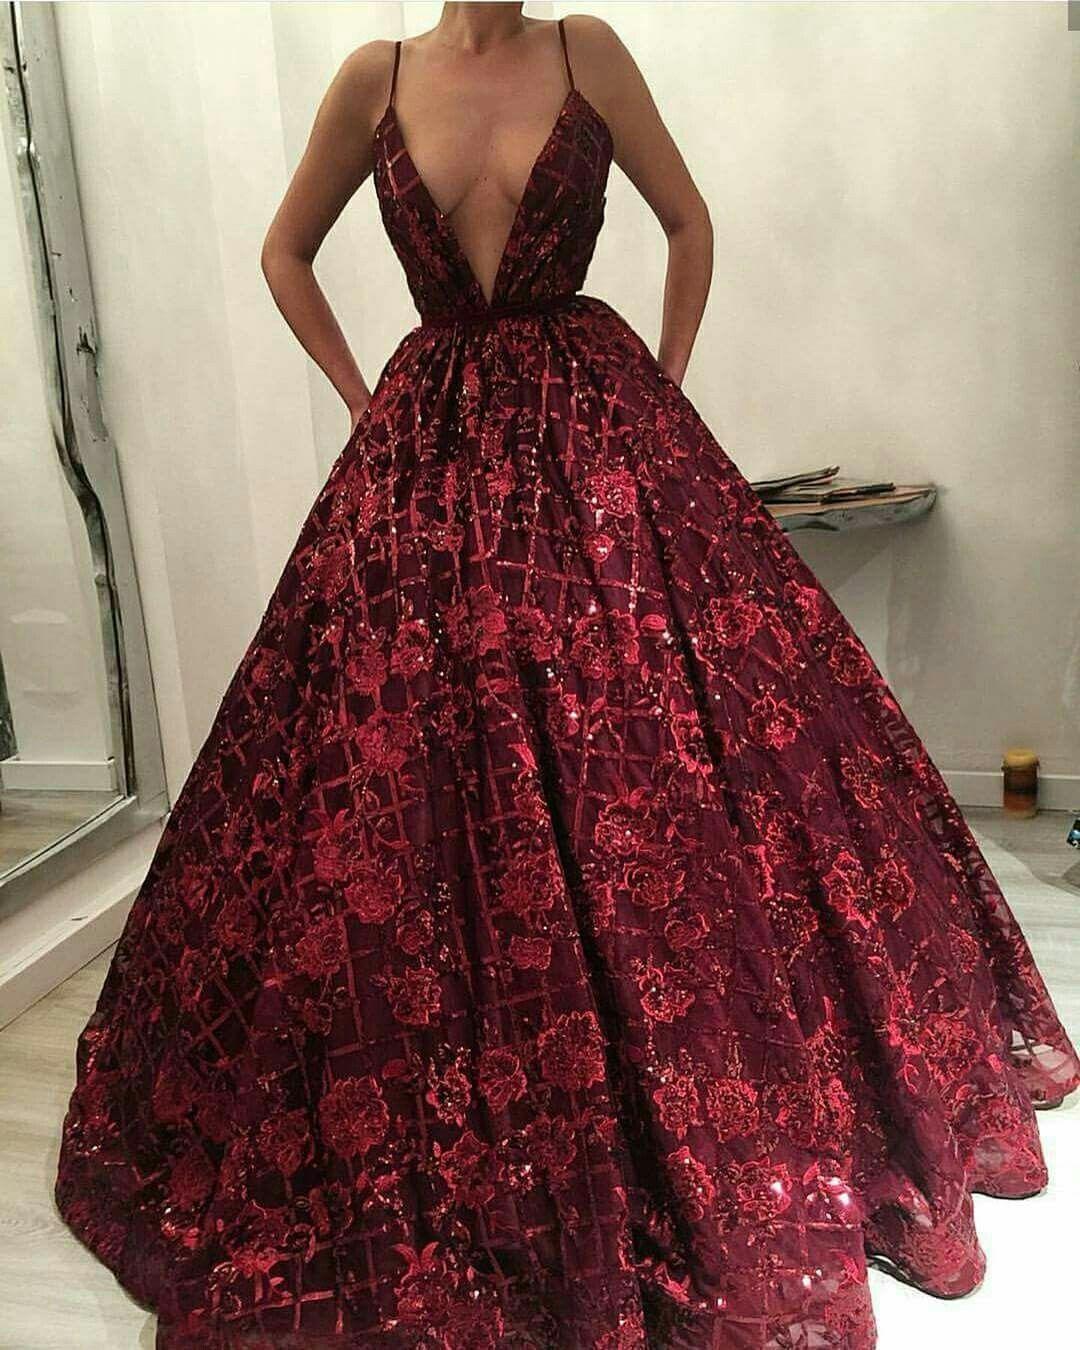 Aline deep vneck floorlength dark red lace prom dress with